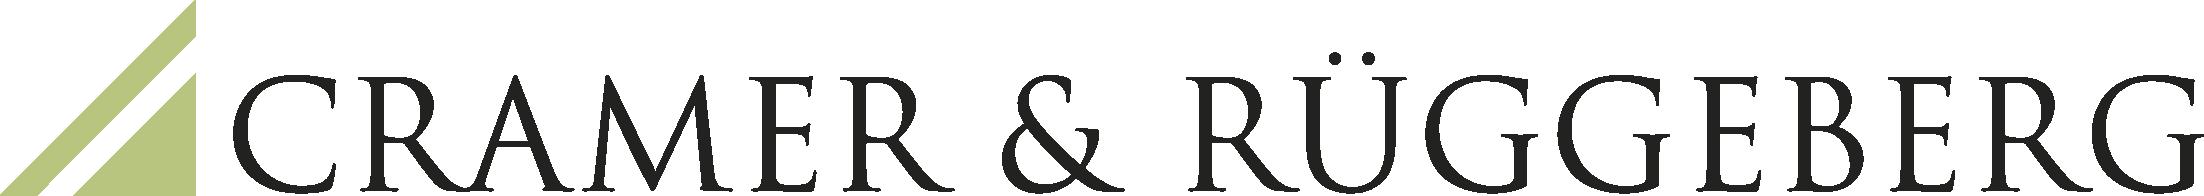 Cramer & Rüggeberg